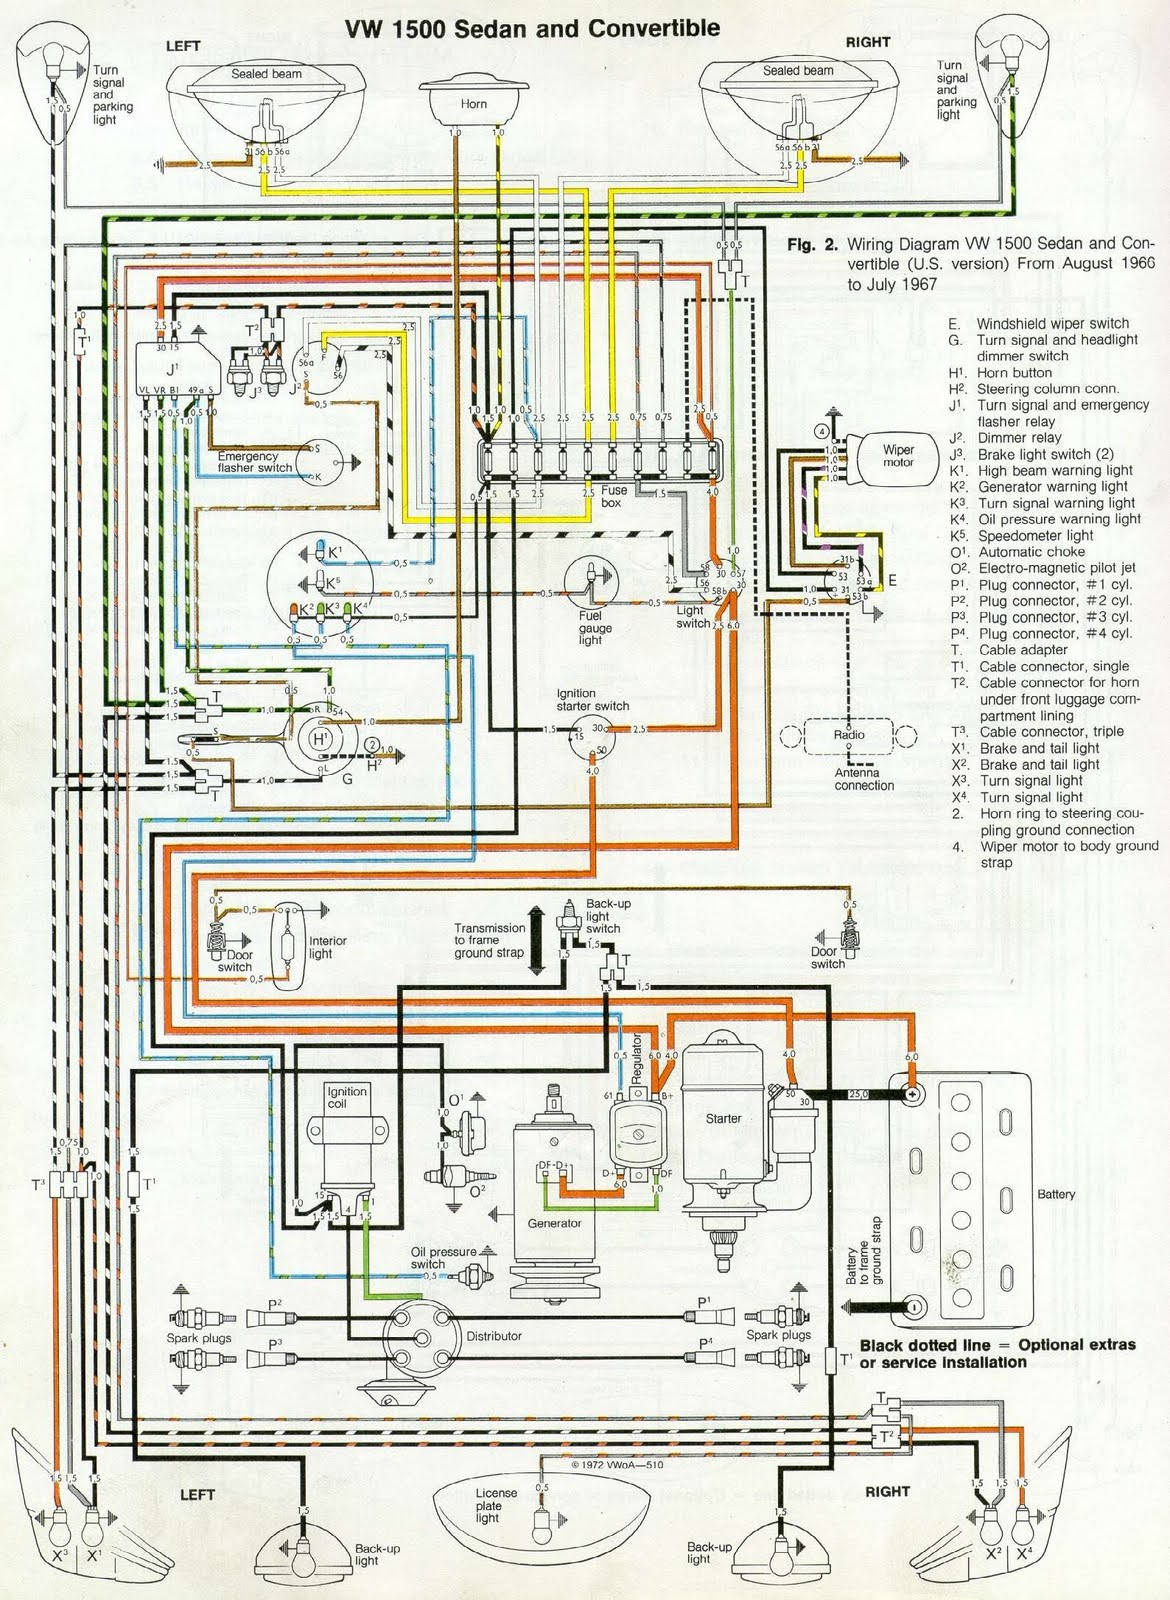 medium resolution of wrg 4274 vw 1971 fuse diagramvw 1971 fuse diagram 21